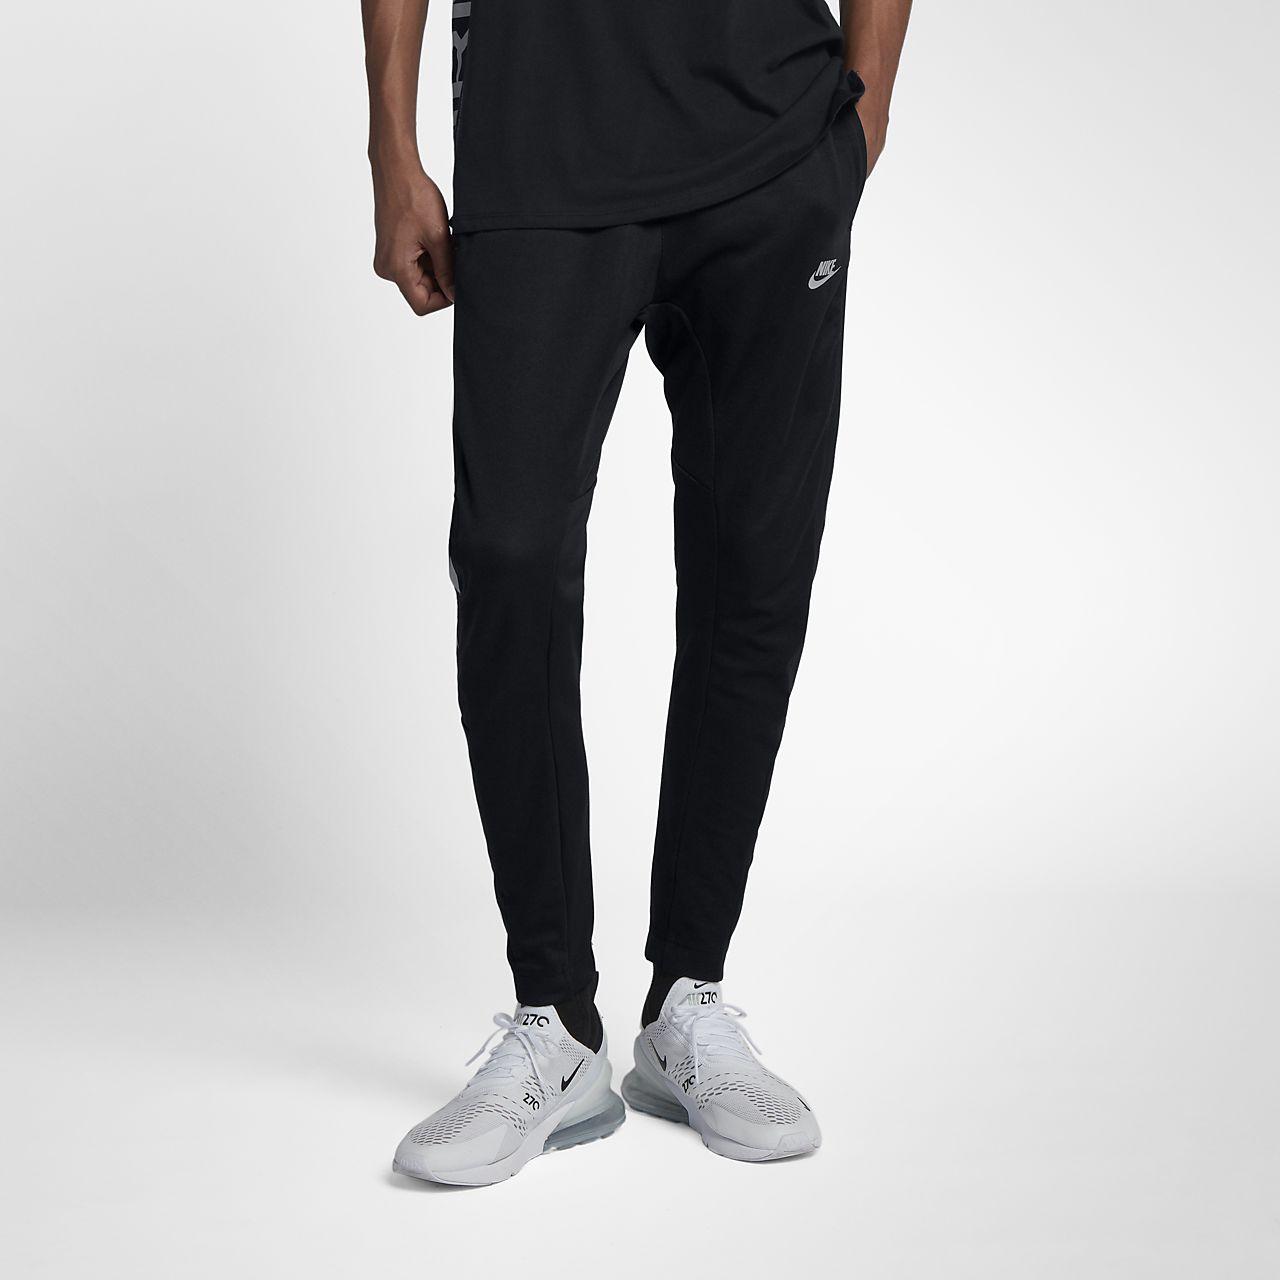 Air Nike Homme Max Pantalon Pour Ca Sportswear xH8wEqU